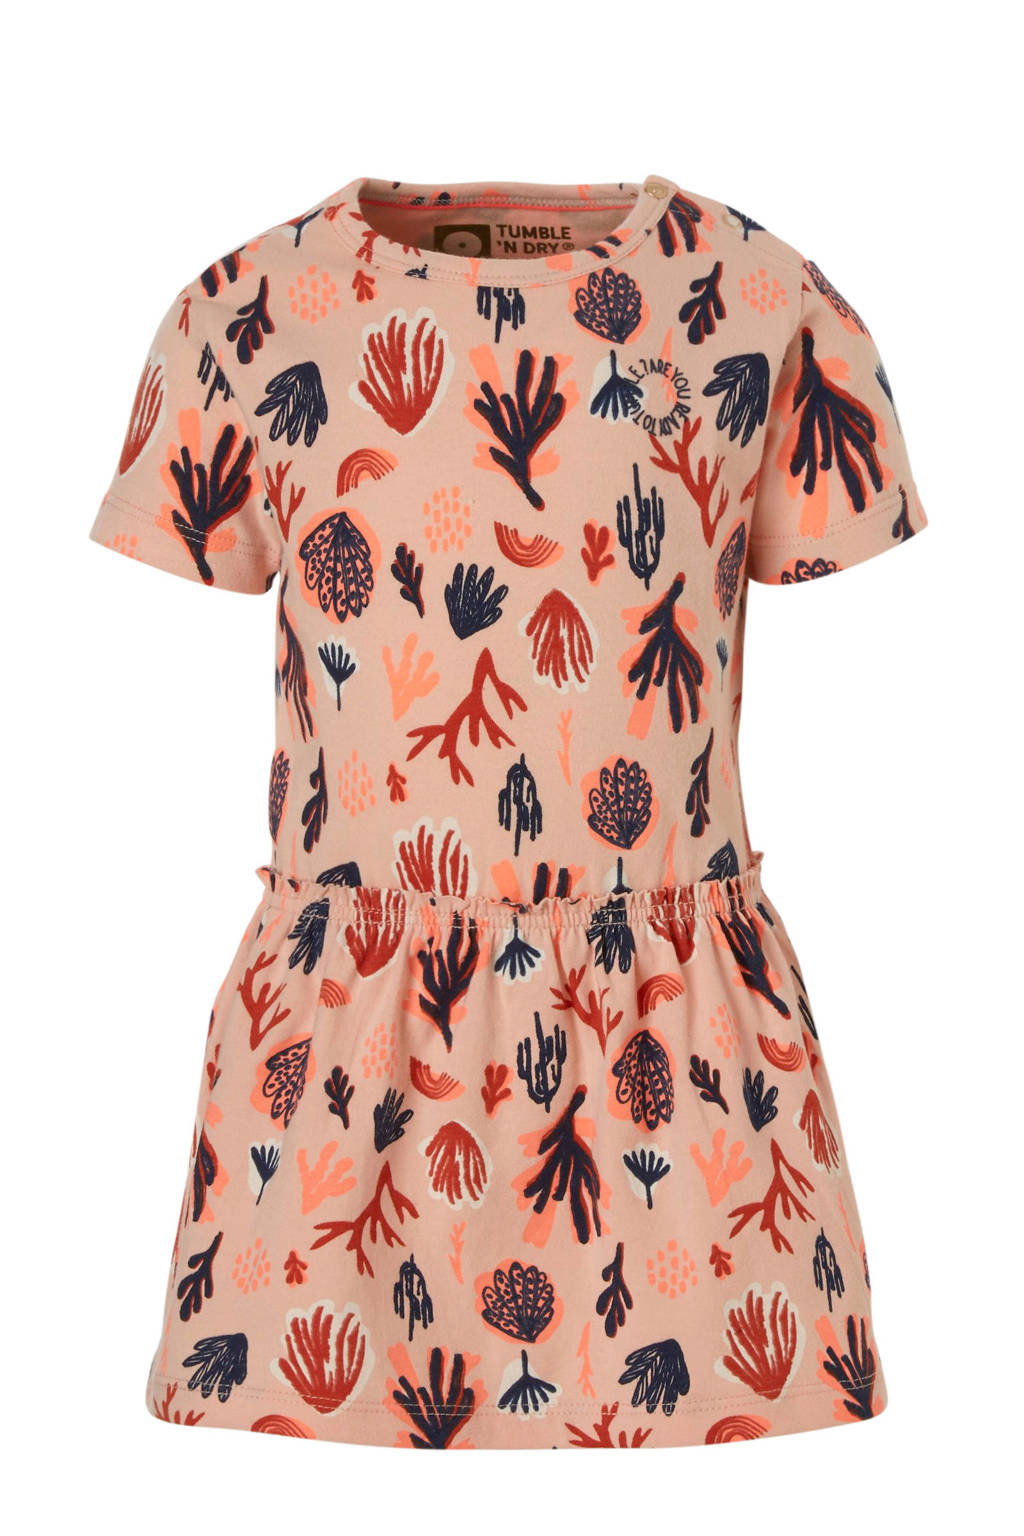 Tumble 'n Dry Lo jurk Elissa lichtoranje, Licht oranje